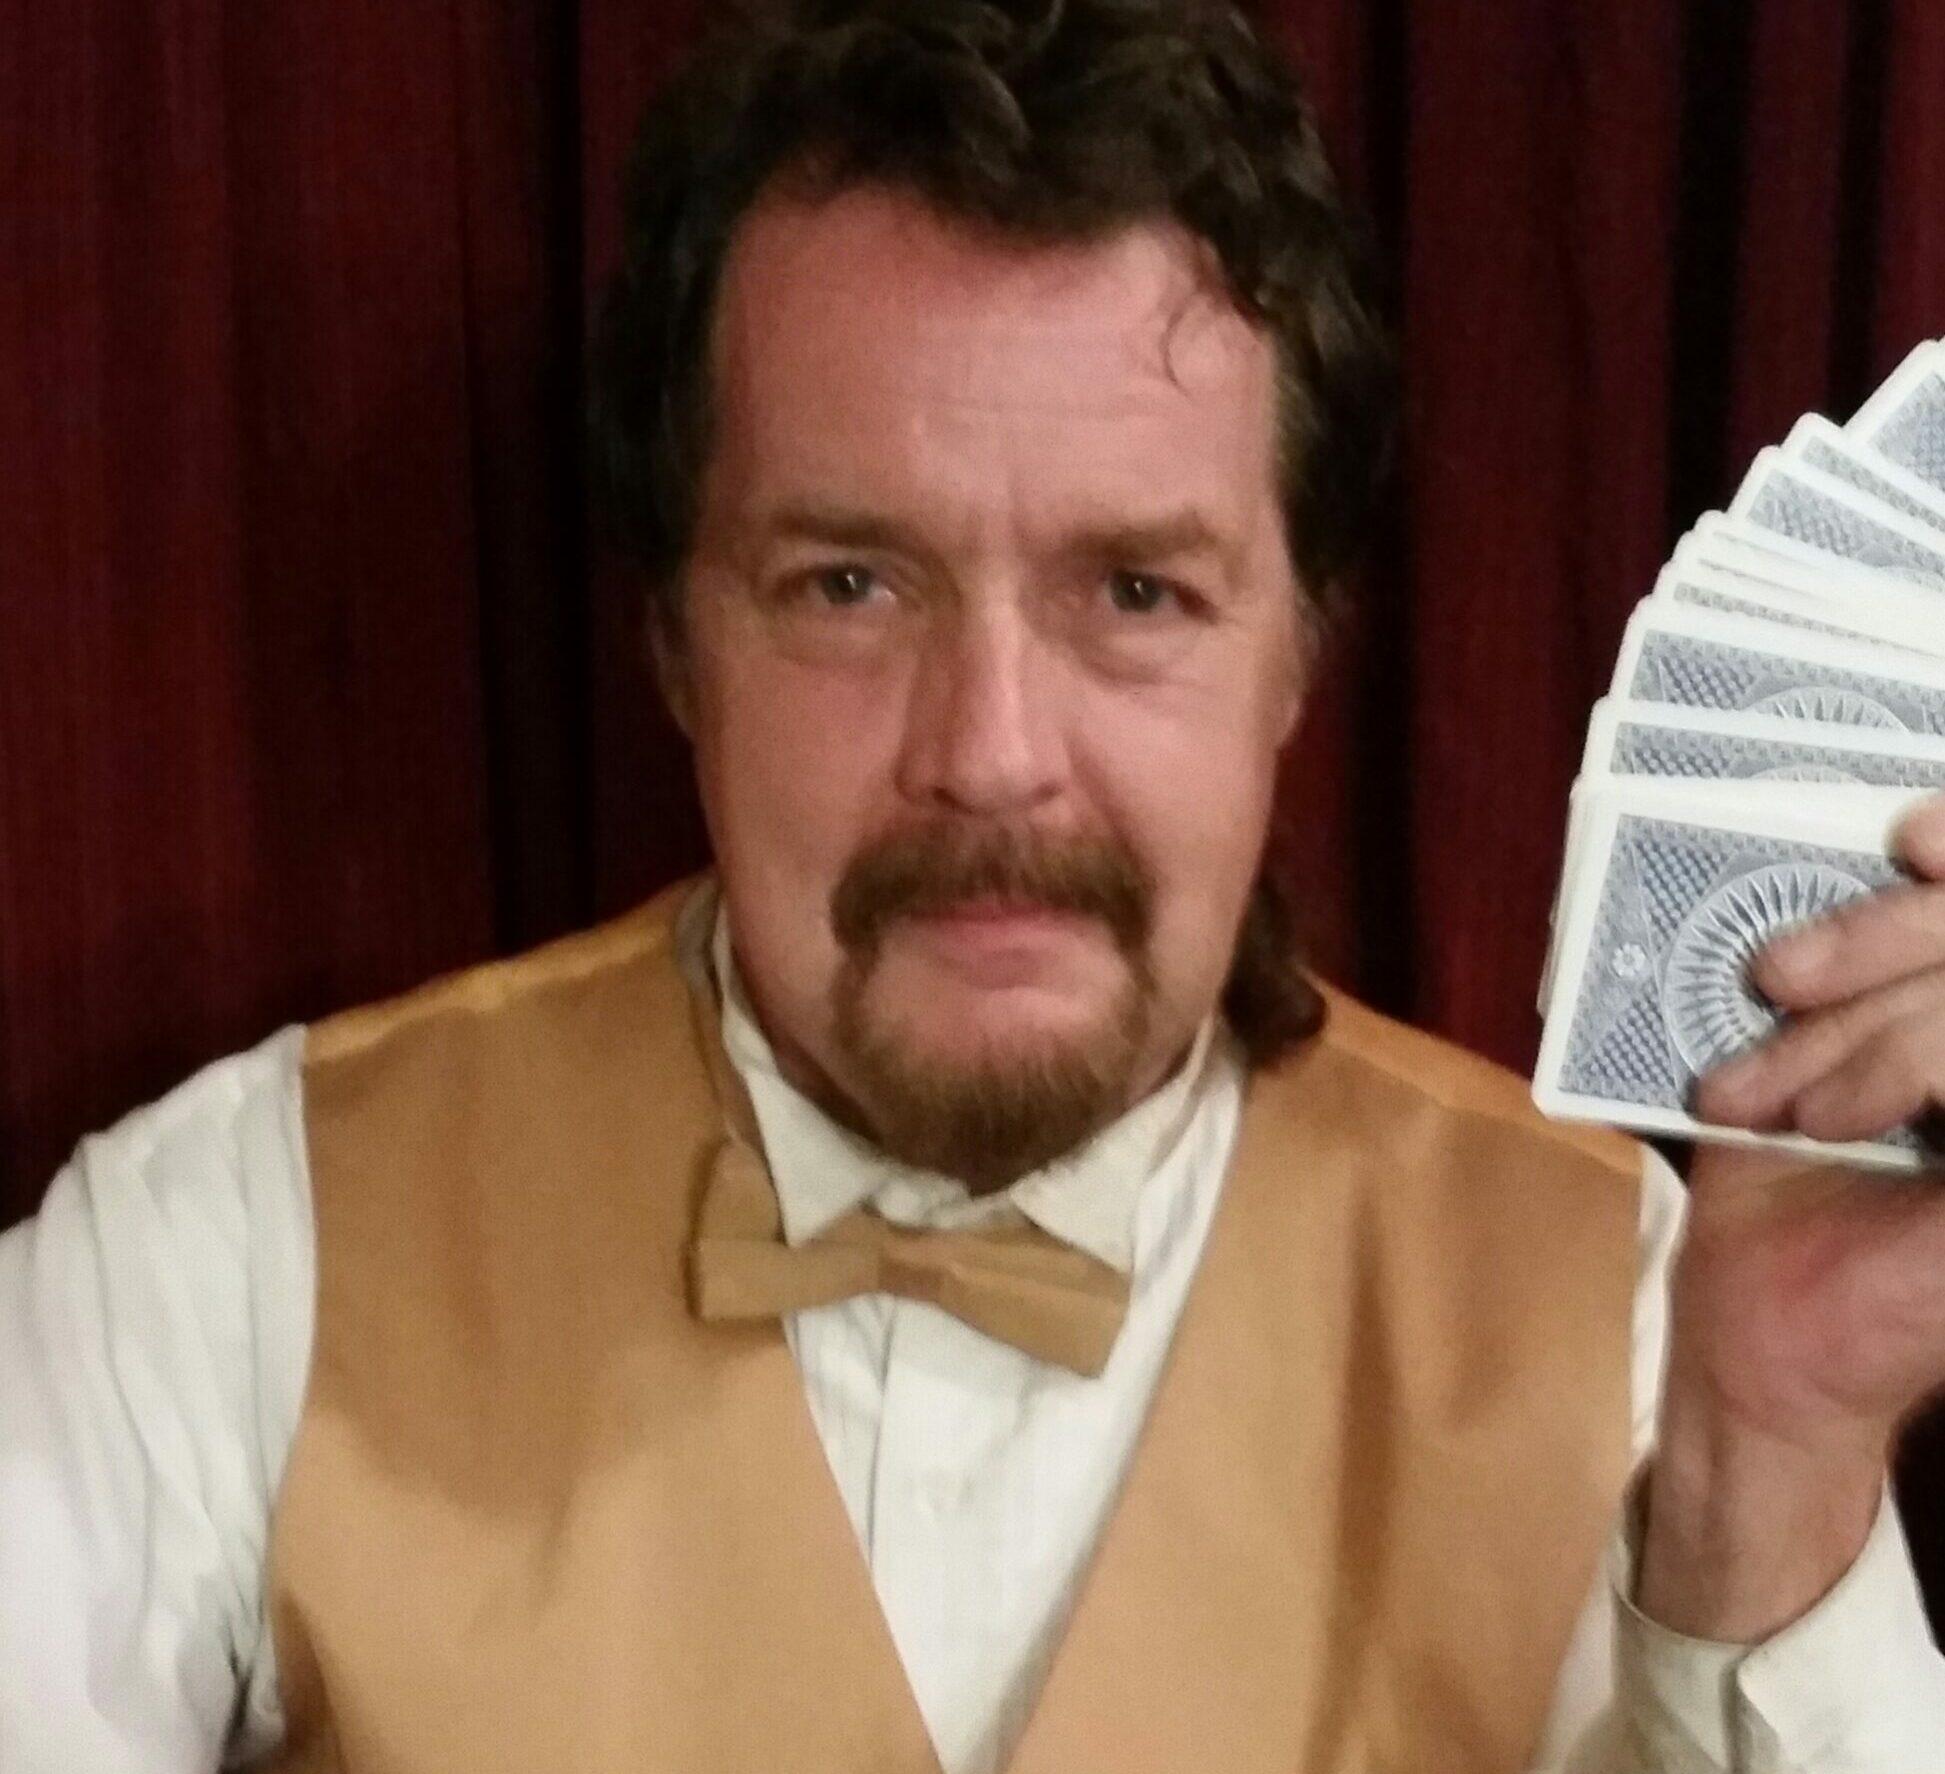 Magicians Chicago.com Singing Telegrams/ Costumed Mascot Characters/Hire Magic Show/ Hire Magicians/ Clowns/ Face Painters/ Balloon Artists